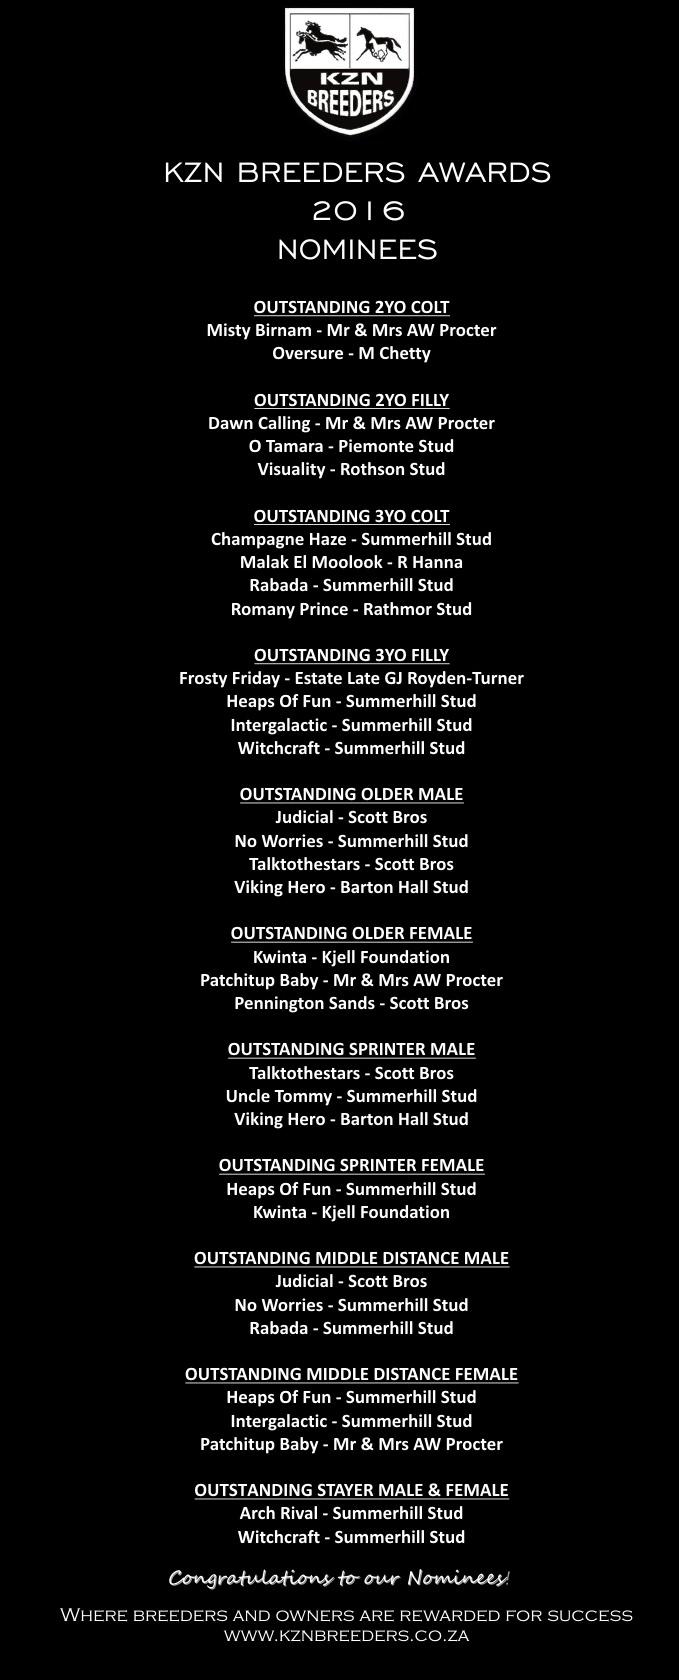 KZN Breeders Awards 2016 Nominations